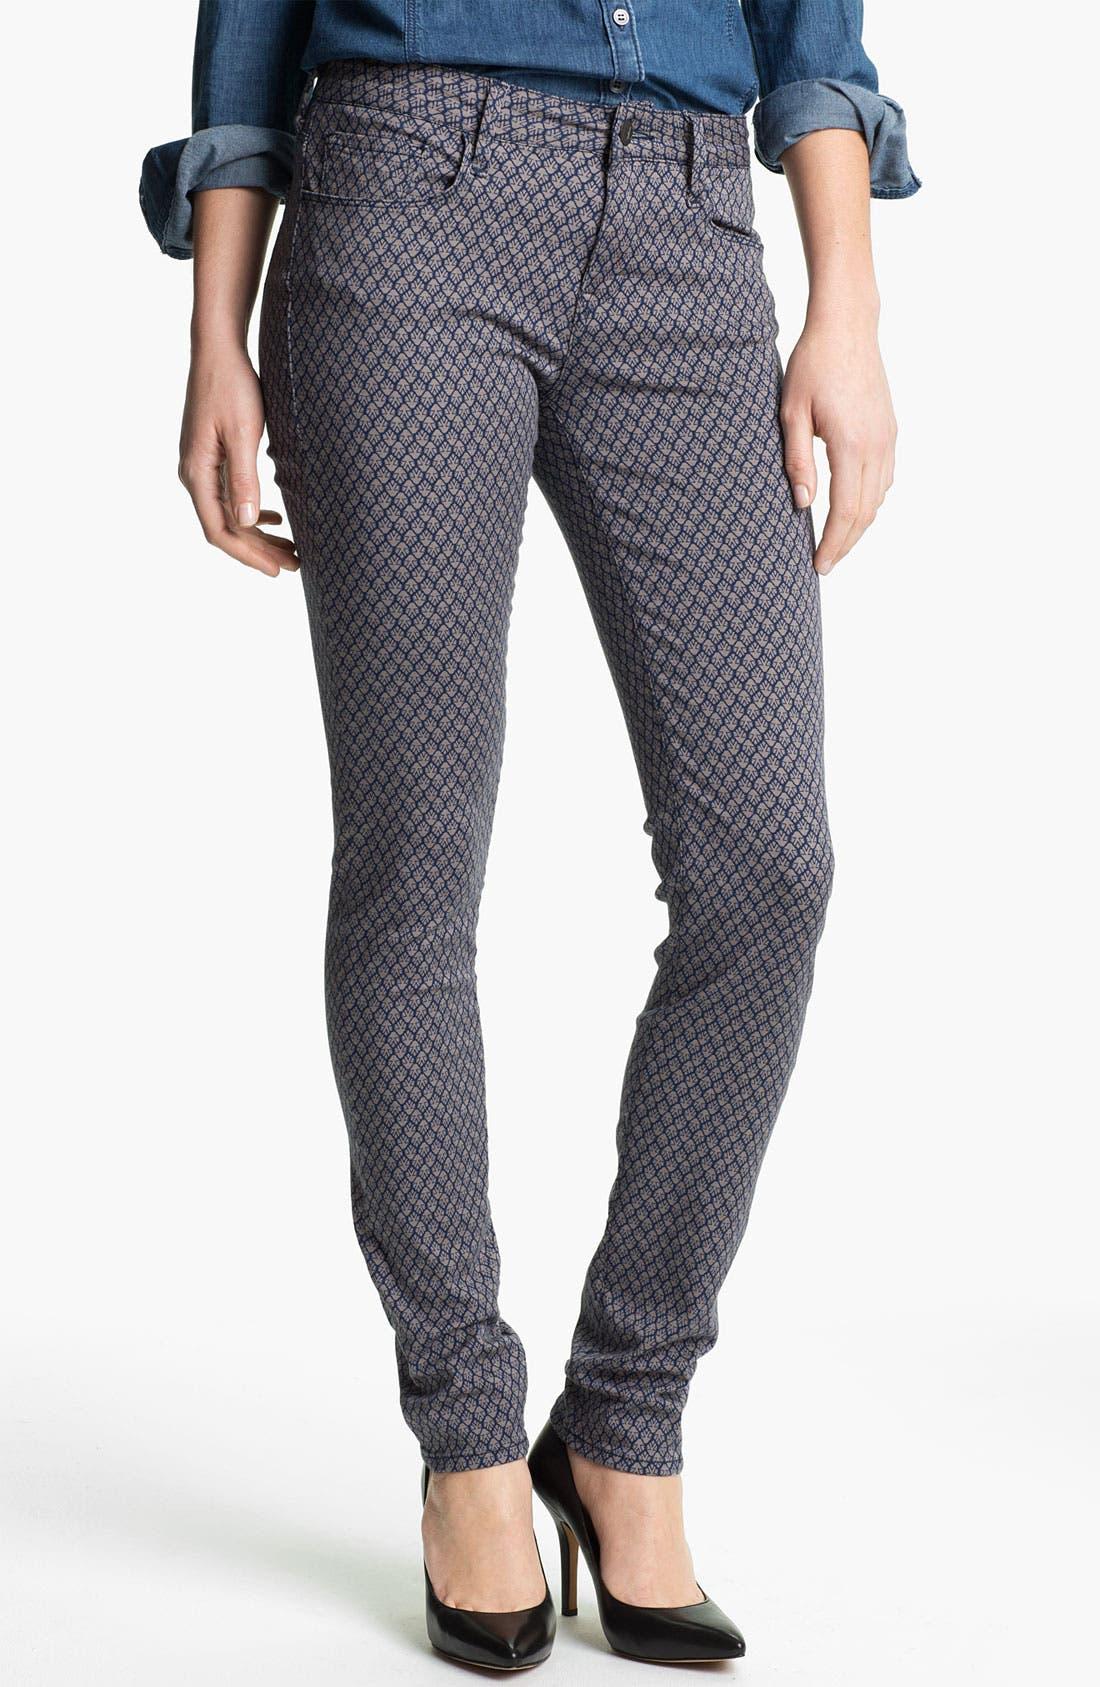 Alternate Image 1 Selected - Mavi Jeans 'Alexa' Geometric Print Skinny Jeans (Online Exclusive)